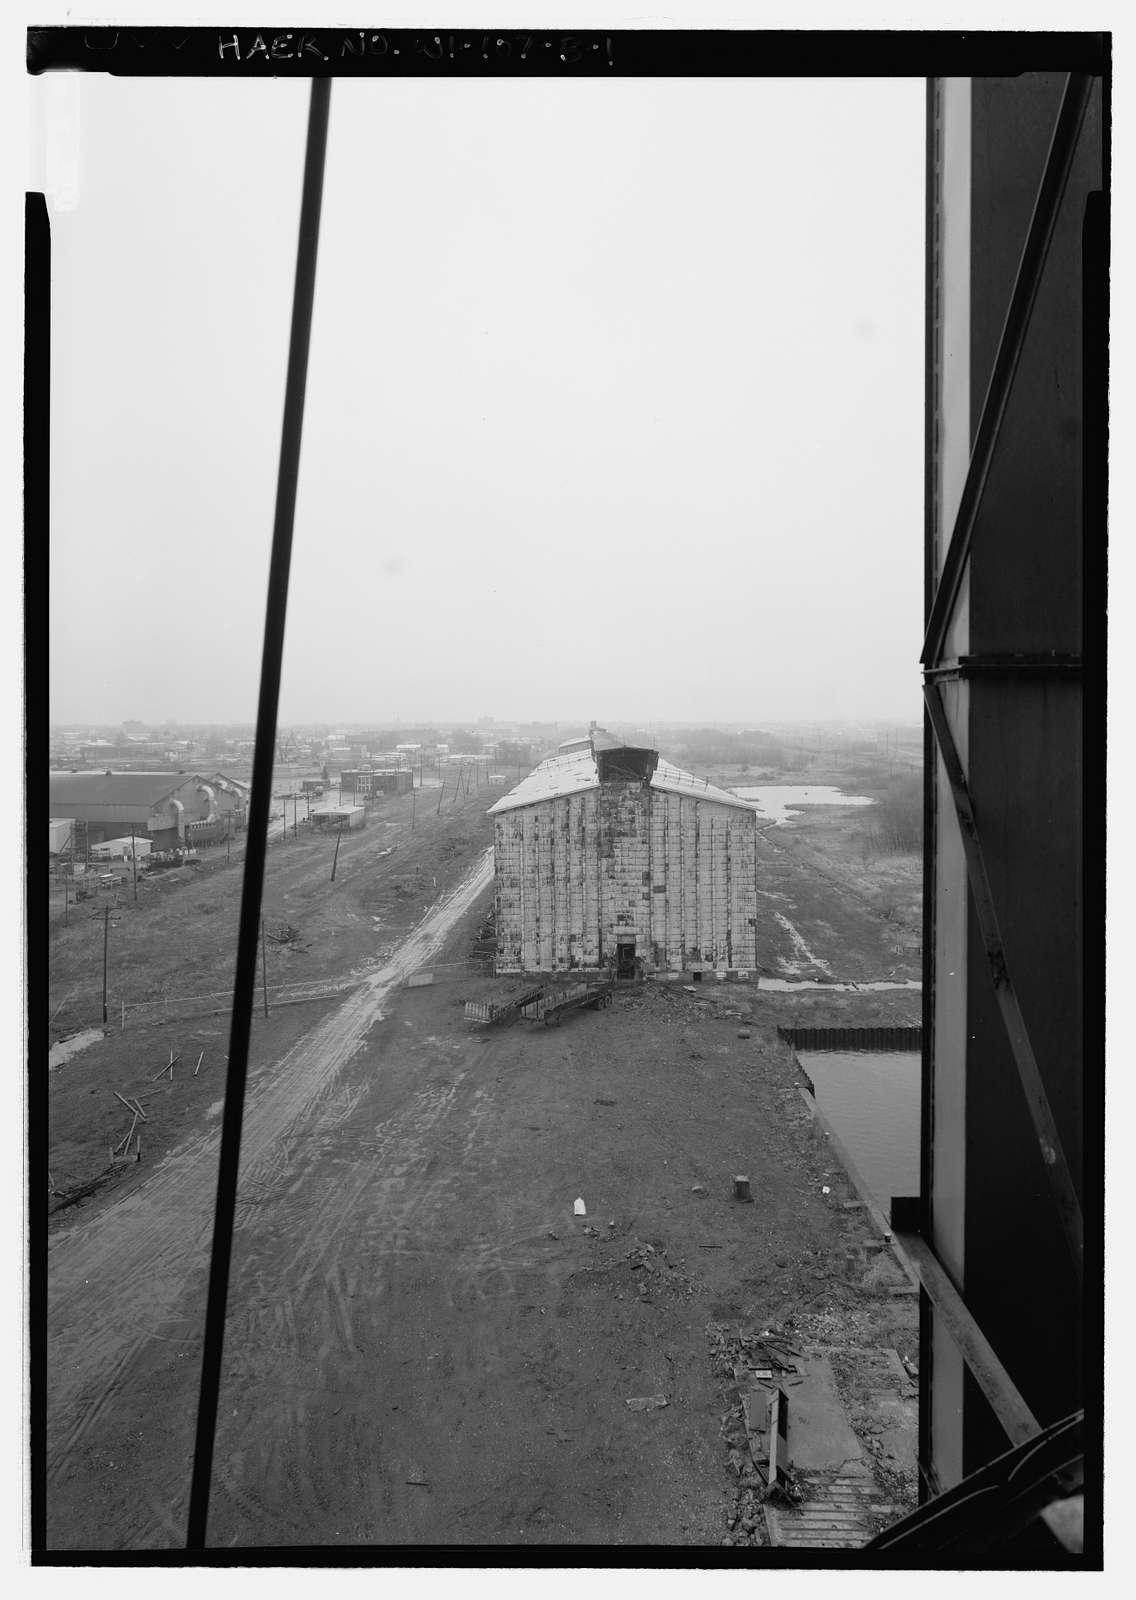 Peavey Globe Elevator, No. 2 House, West Gate Basin & Howard's Bay, east side of slip, Superior, Douglas County, WI